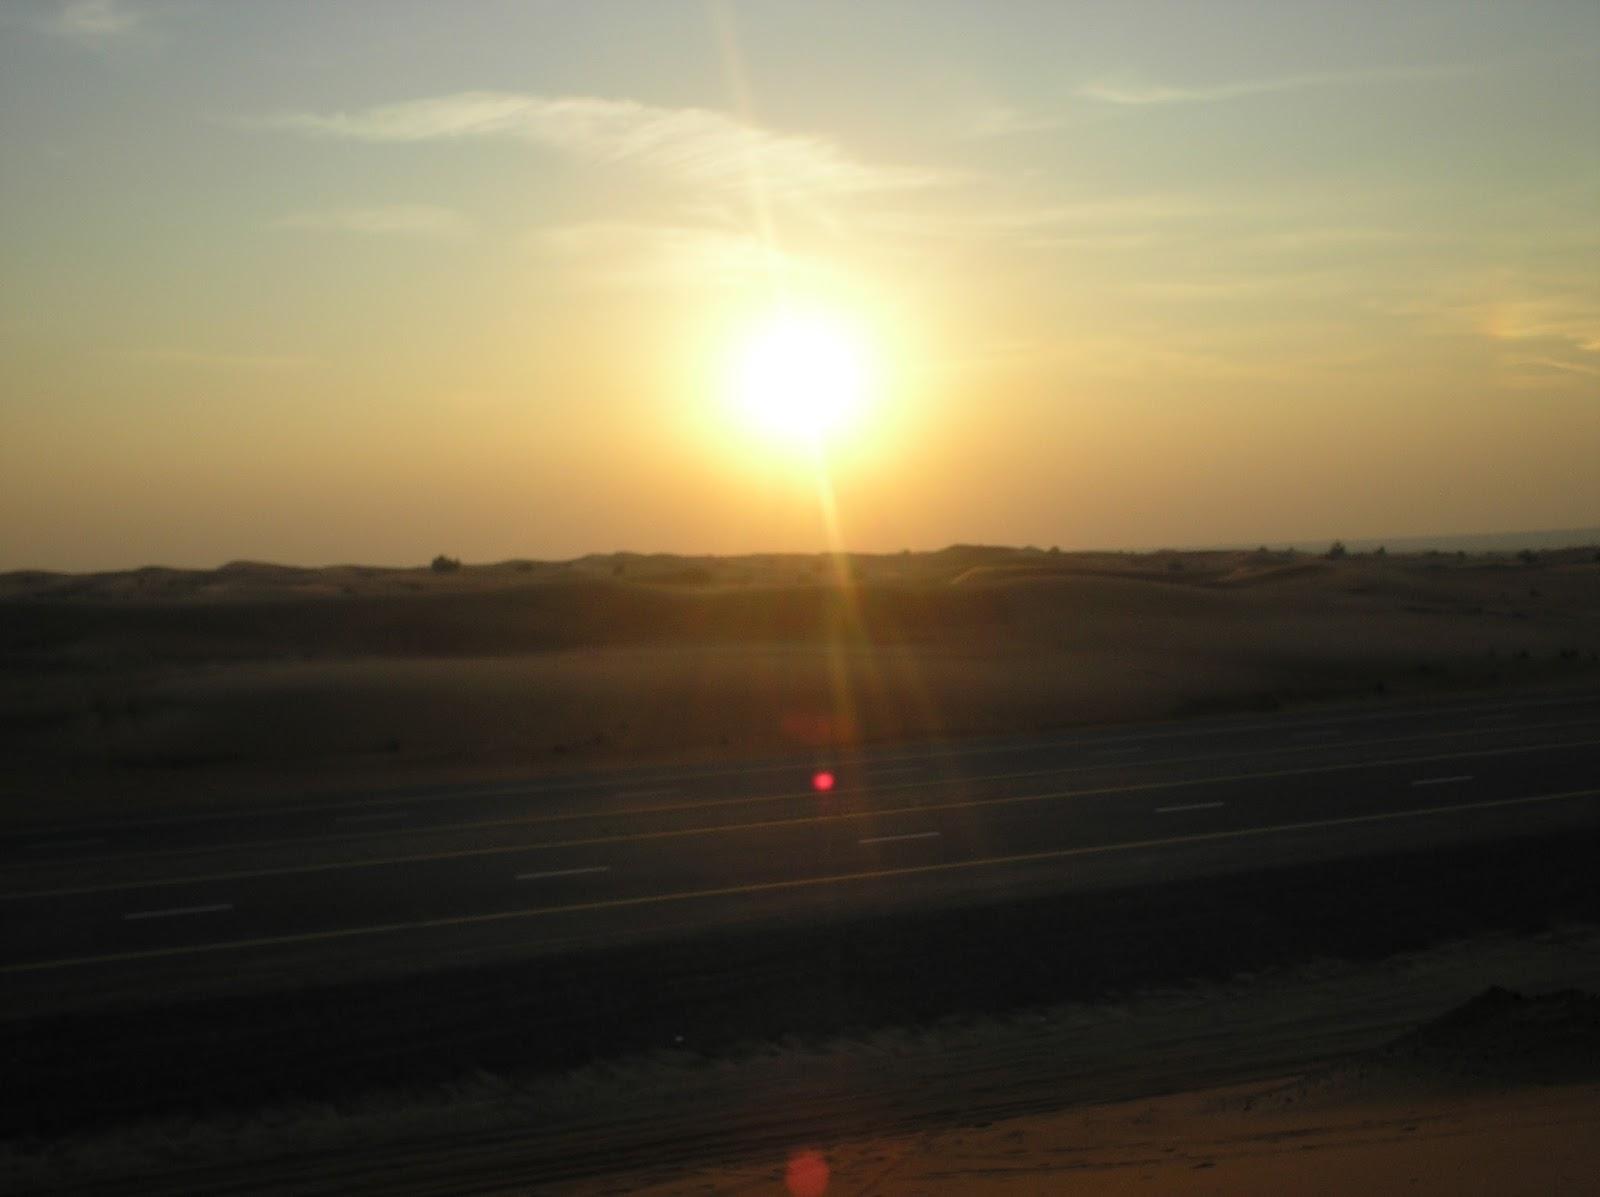 sand dune ride, dubai